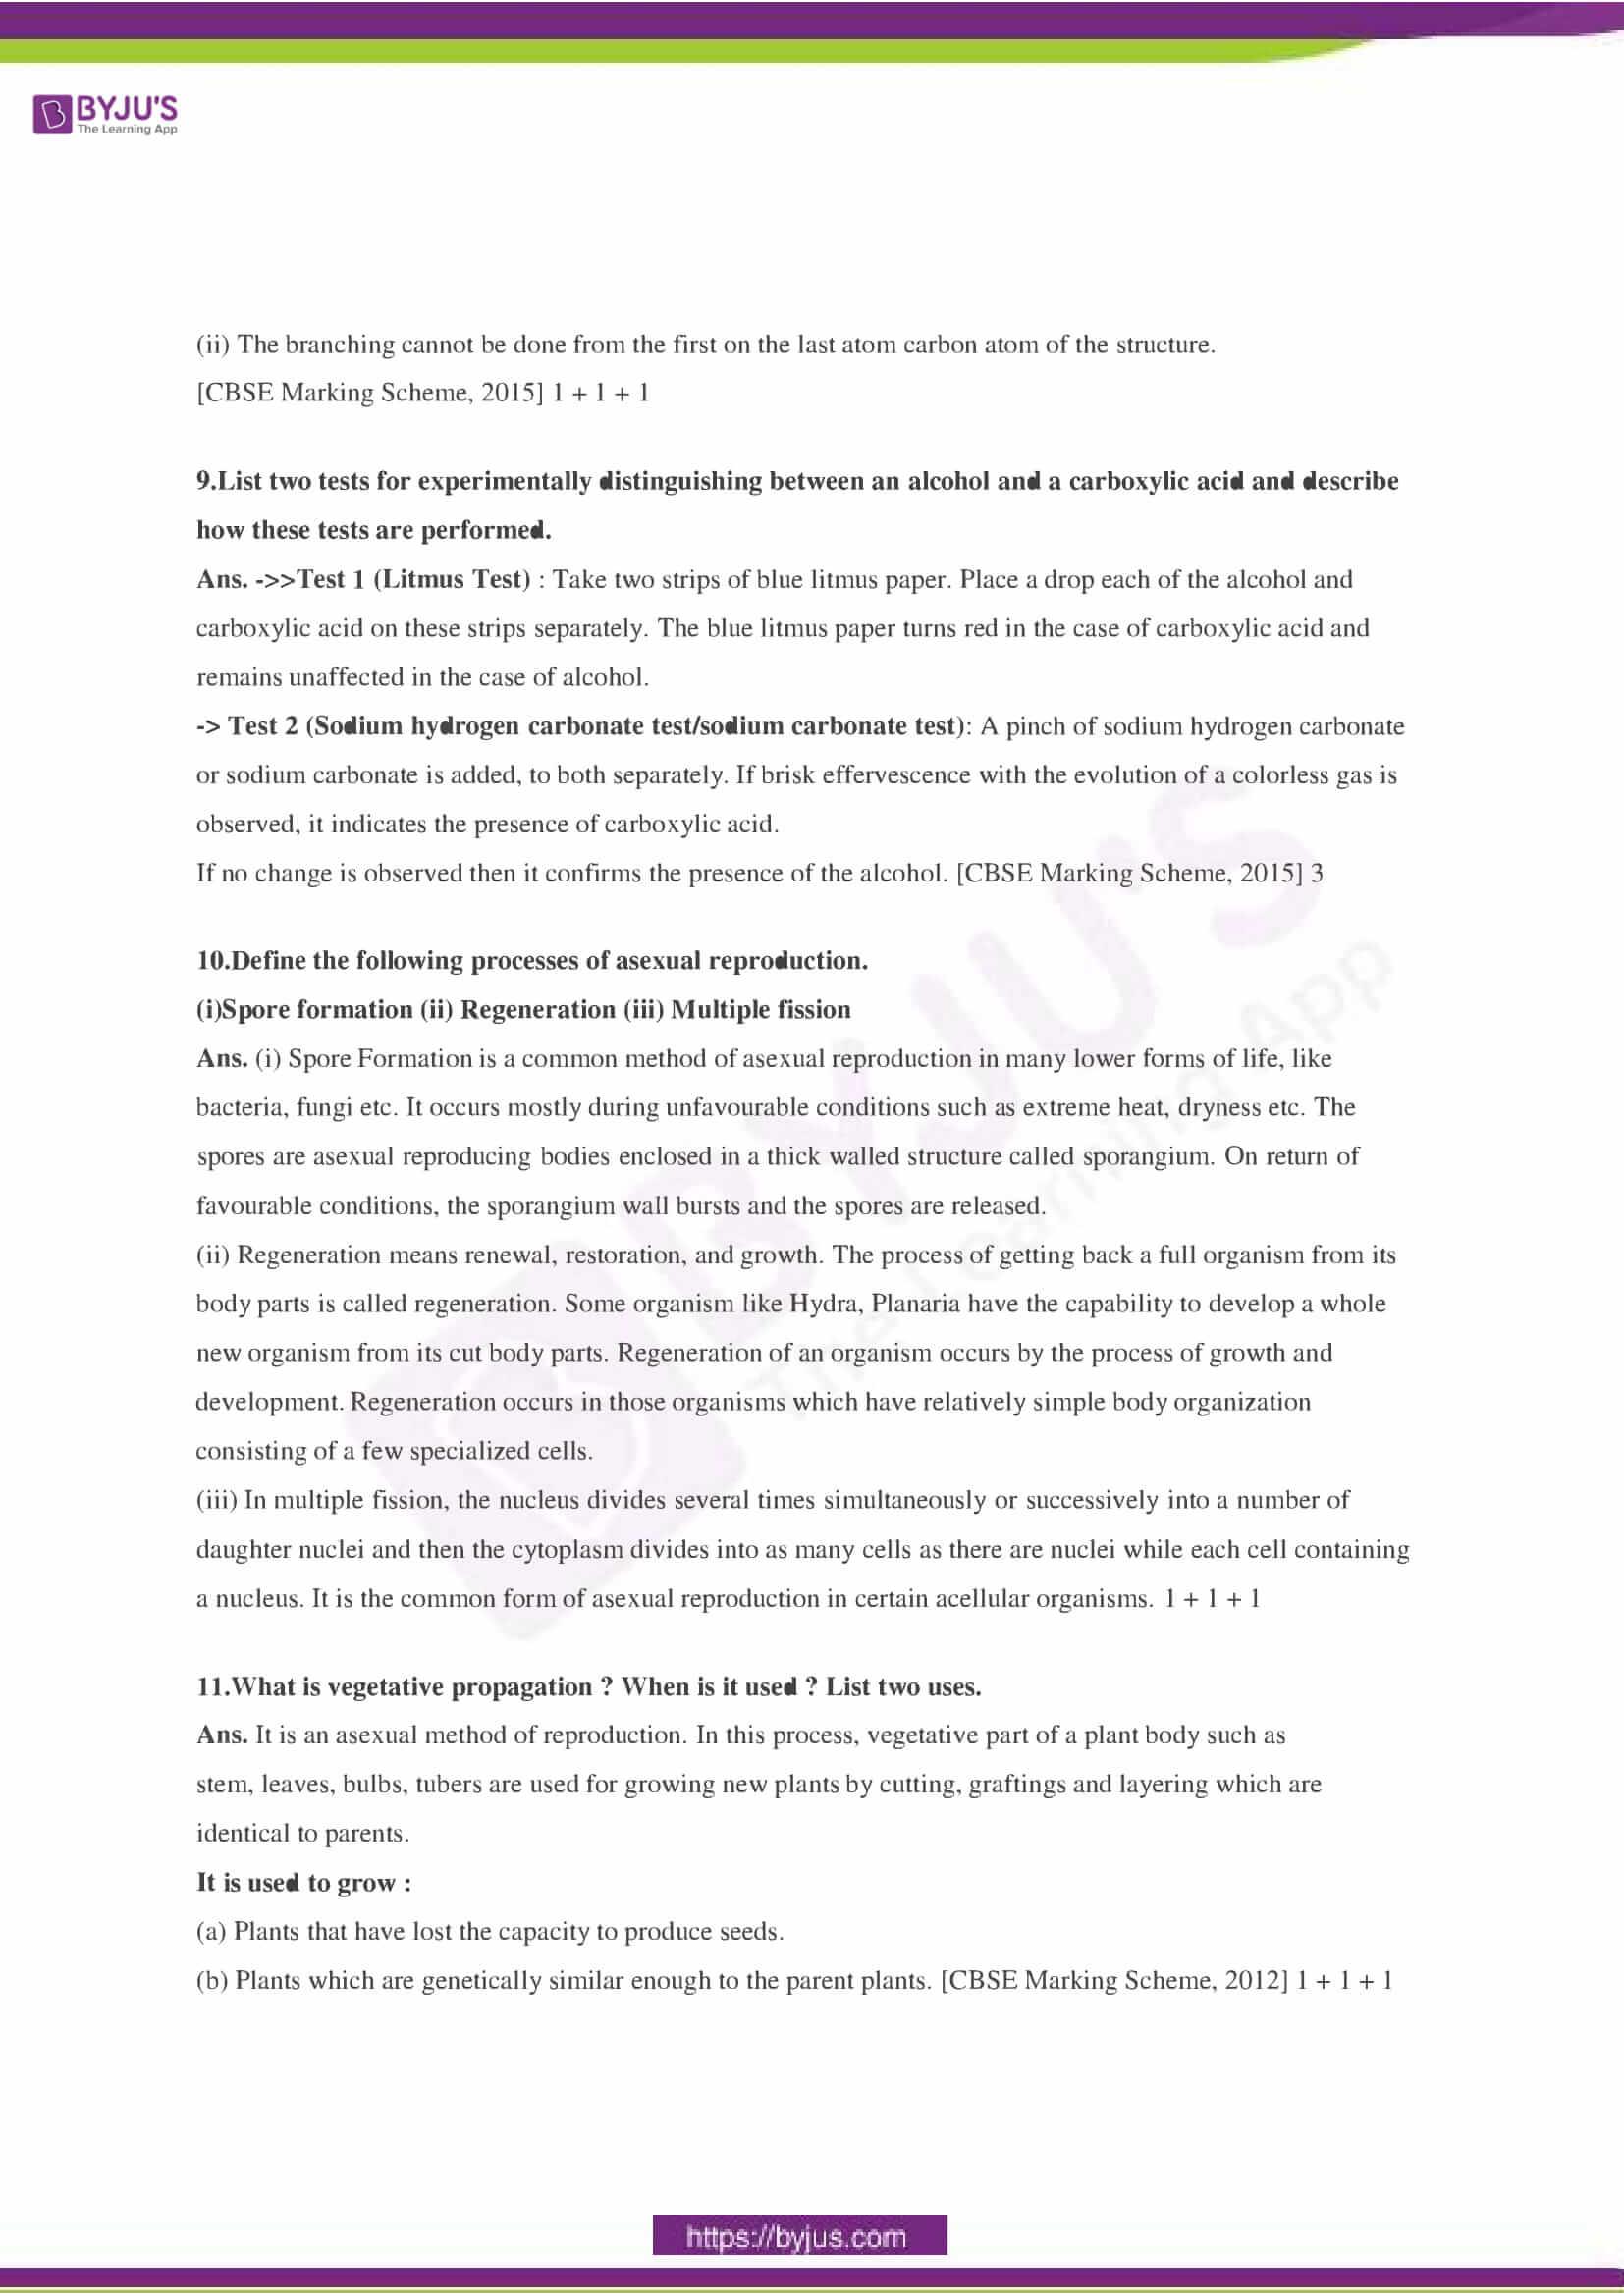 CBSE Class 10 Science Sample Paper Solution Set 3-03